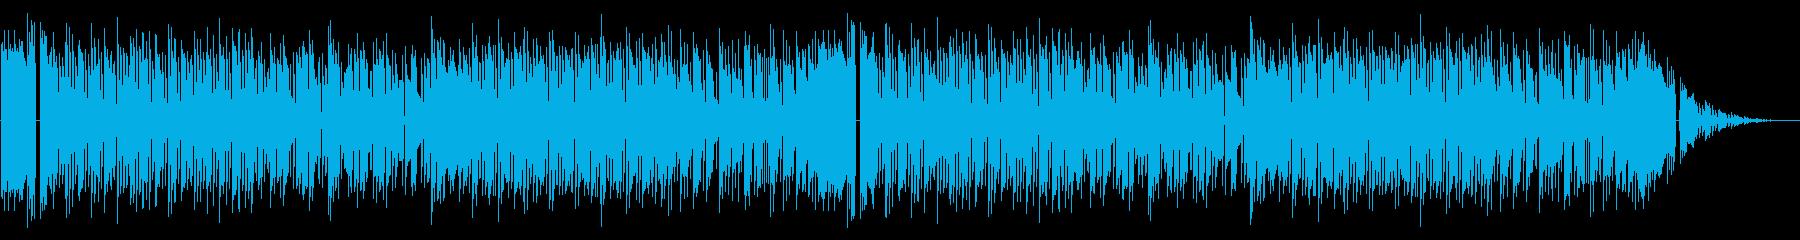 NES STG C04-1(ステージ3)の再生済みの波形